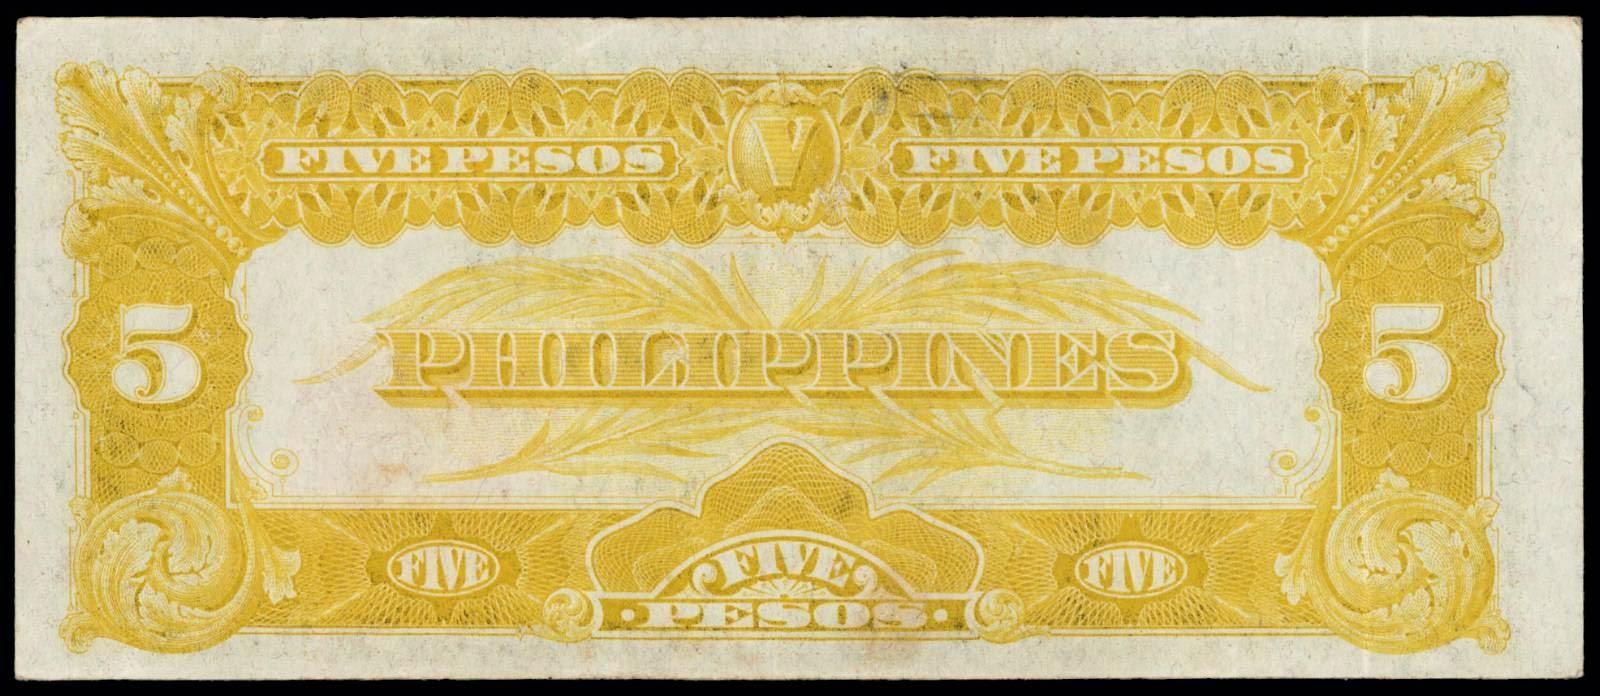 1936 Philippines Five Pesos Treasury Certificate